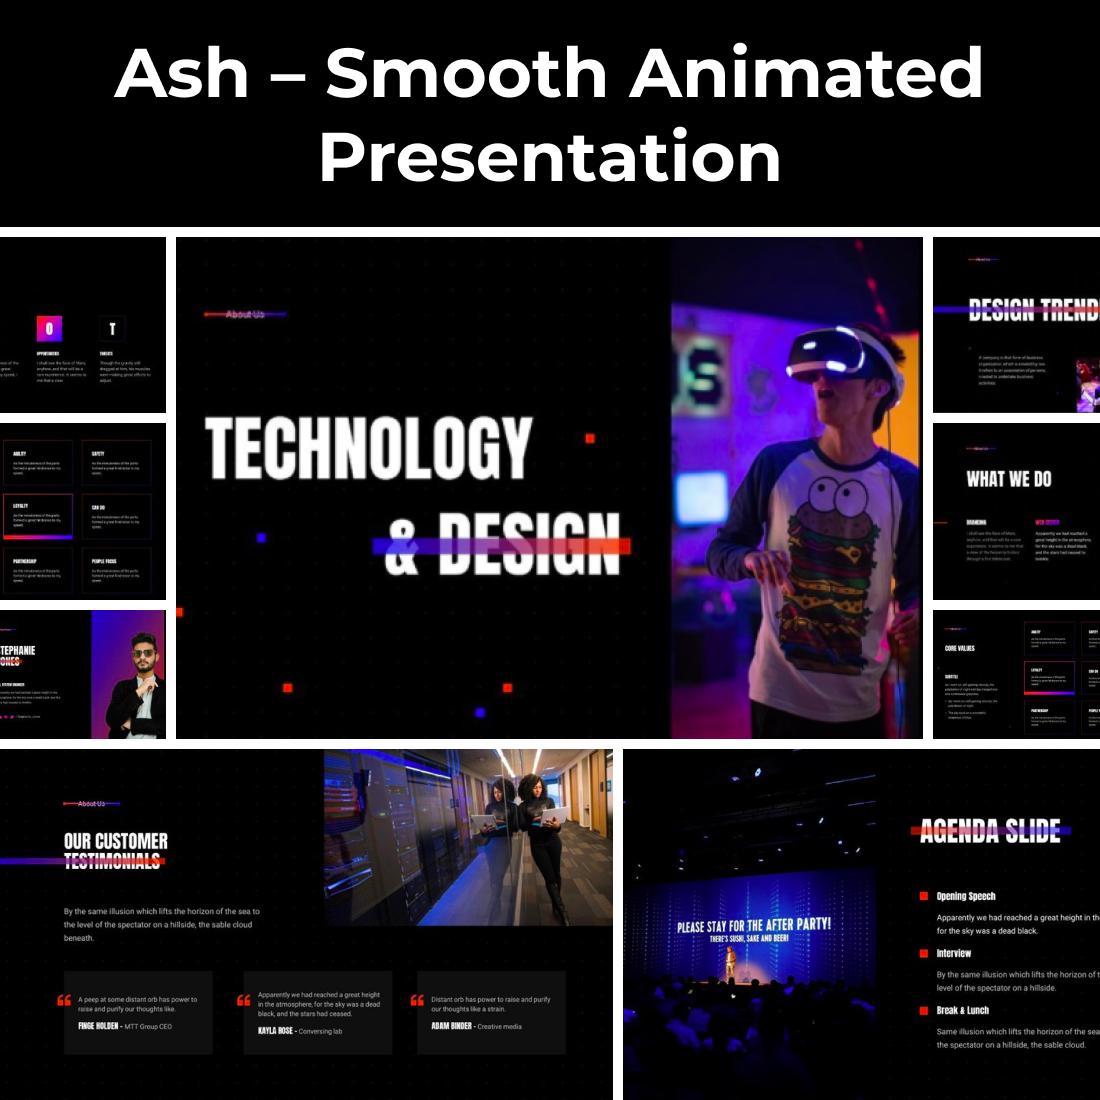 50 Slides Music Presentation Template 2021: Powerpoint, Google Slides & Keynote